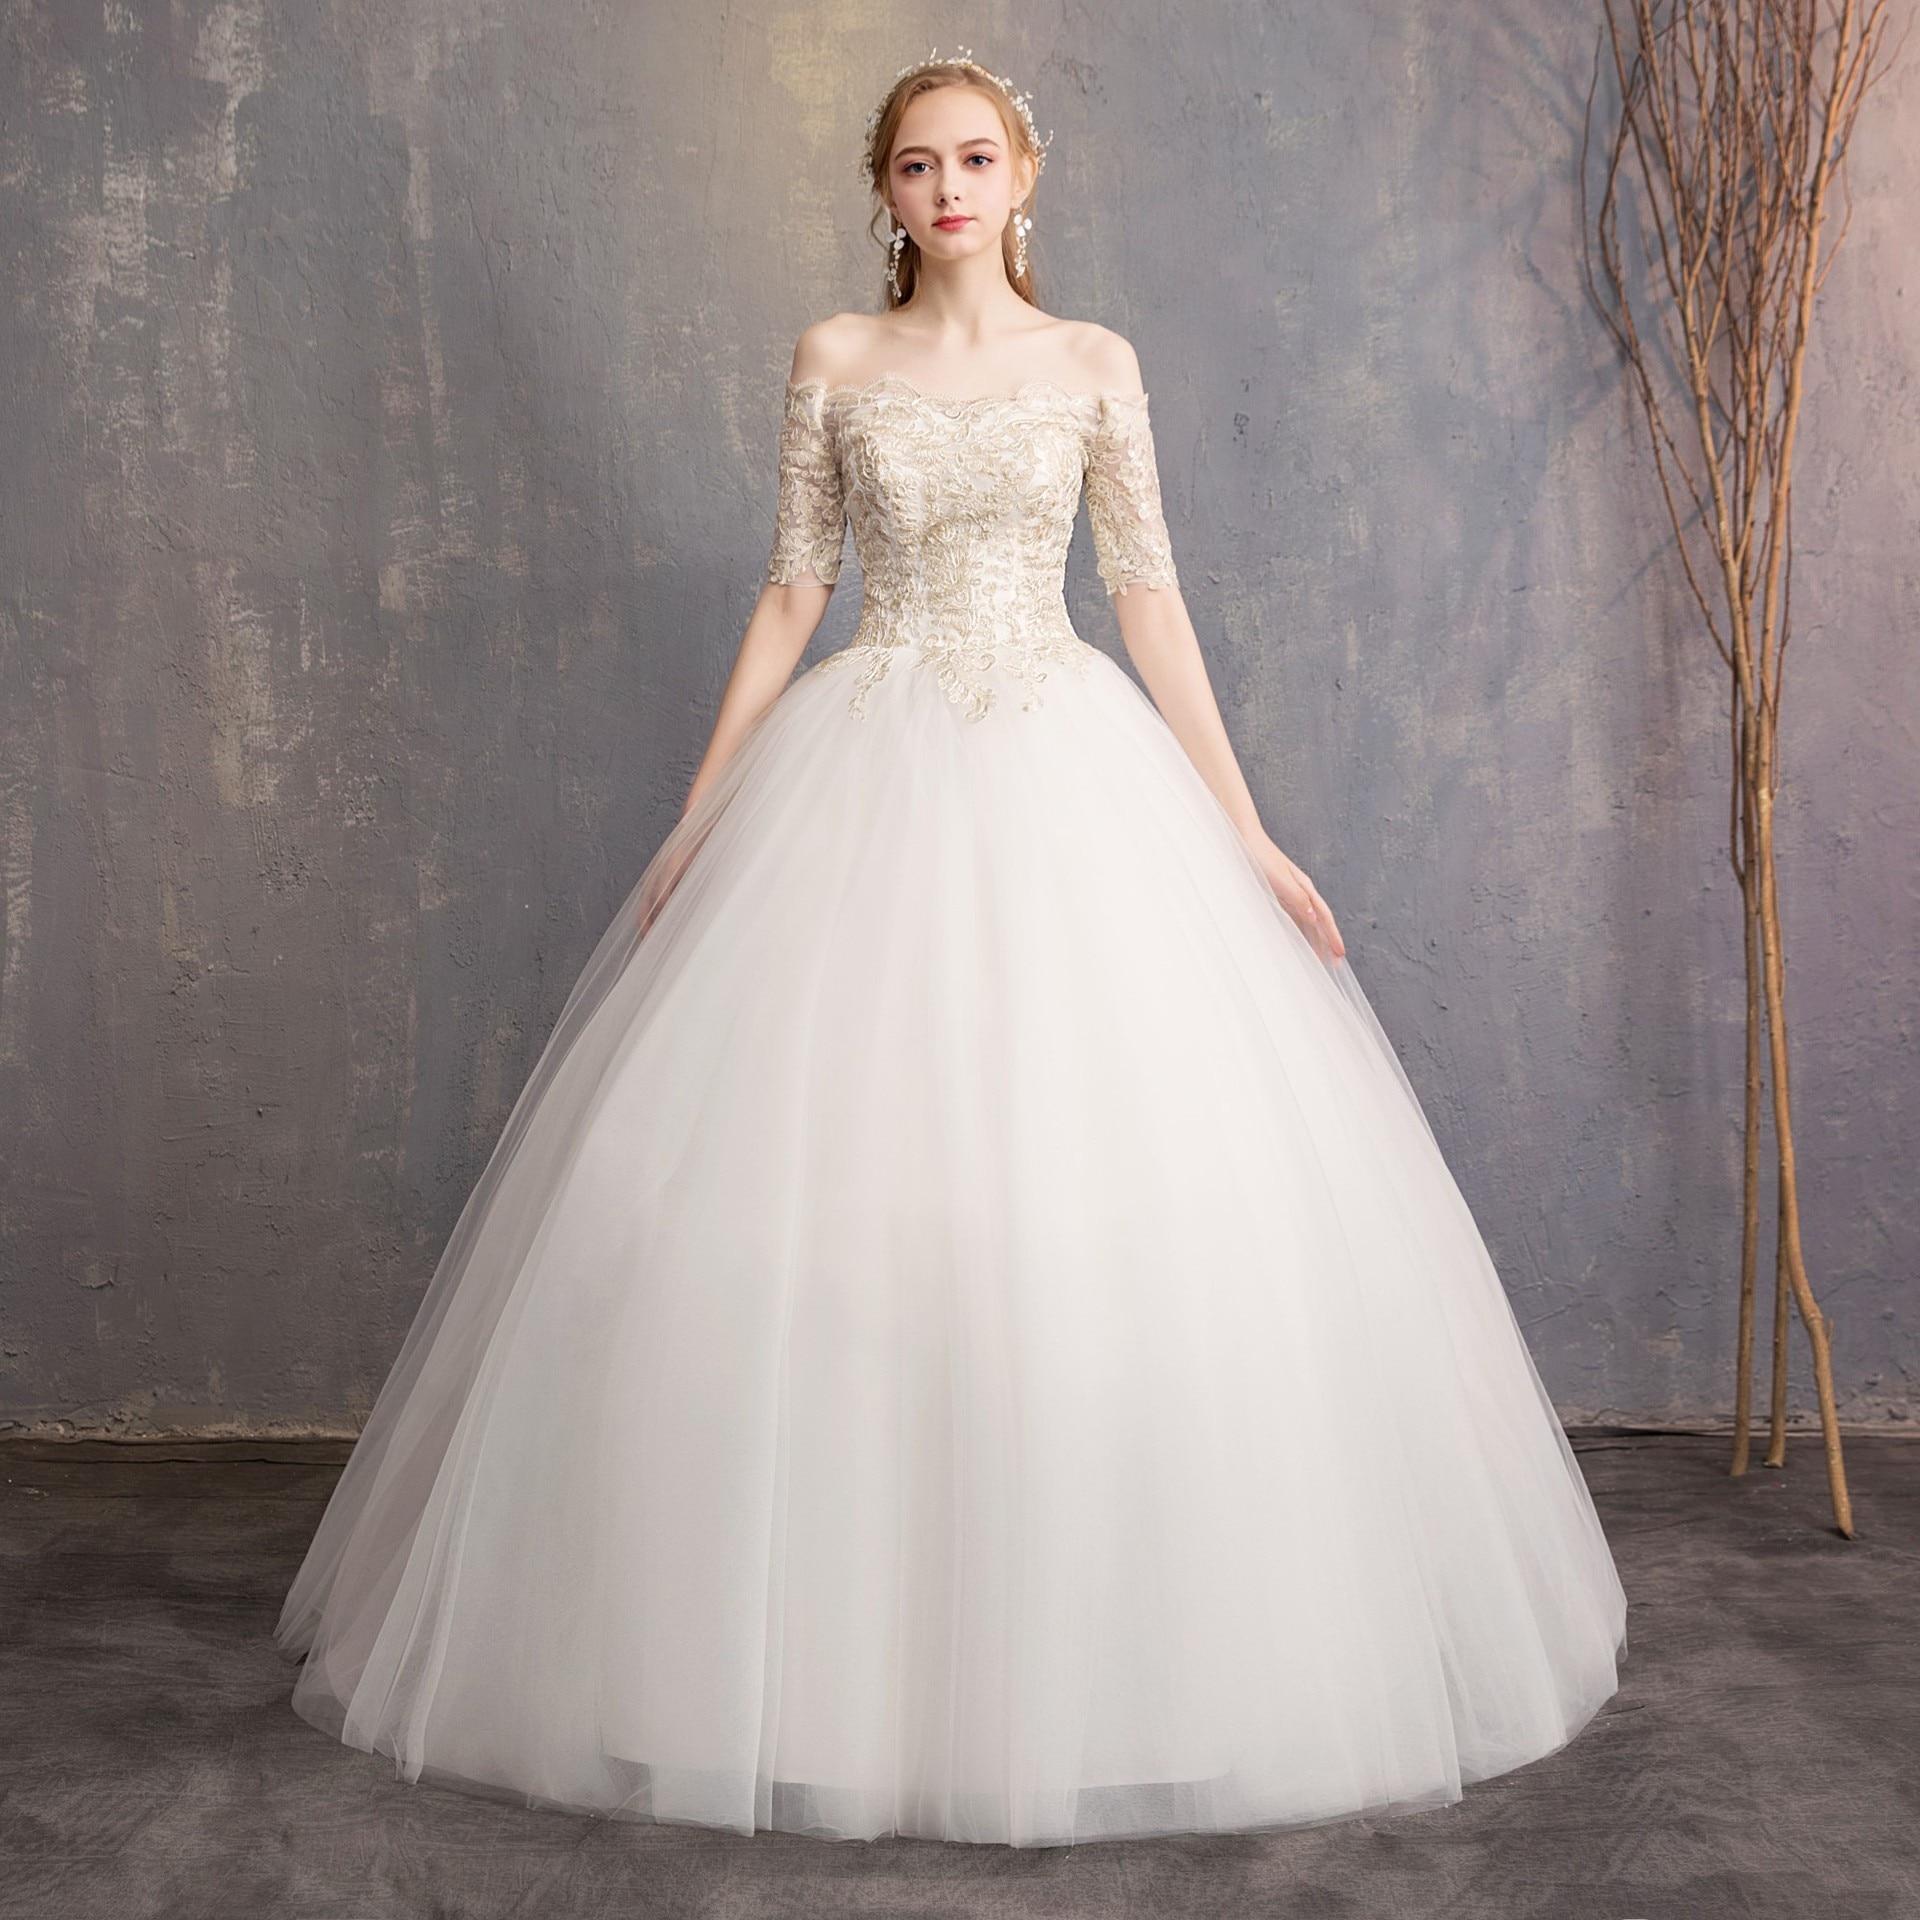 Bridal Elegent Light Wedding Dress 2019 New Style Shoulderless Champagne Lace Half-sleeves Large Size Slim Wedding Dress